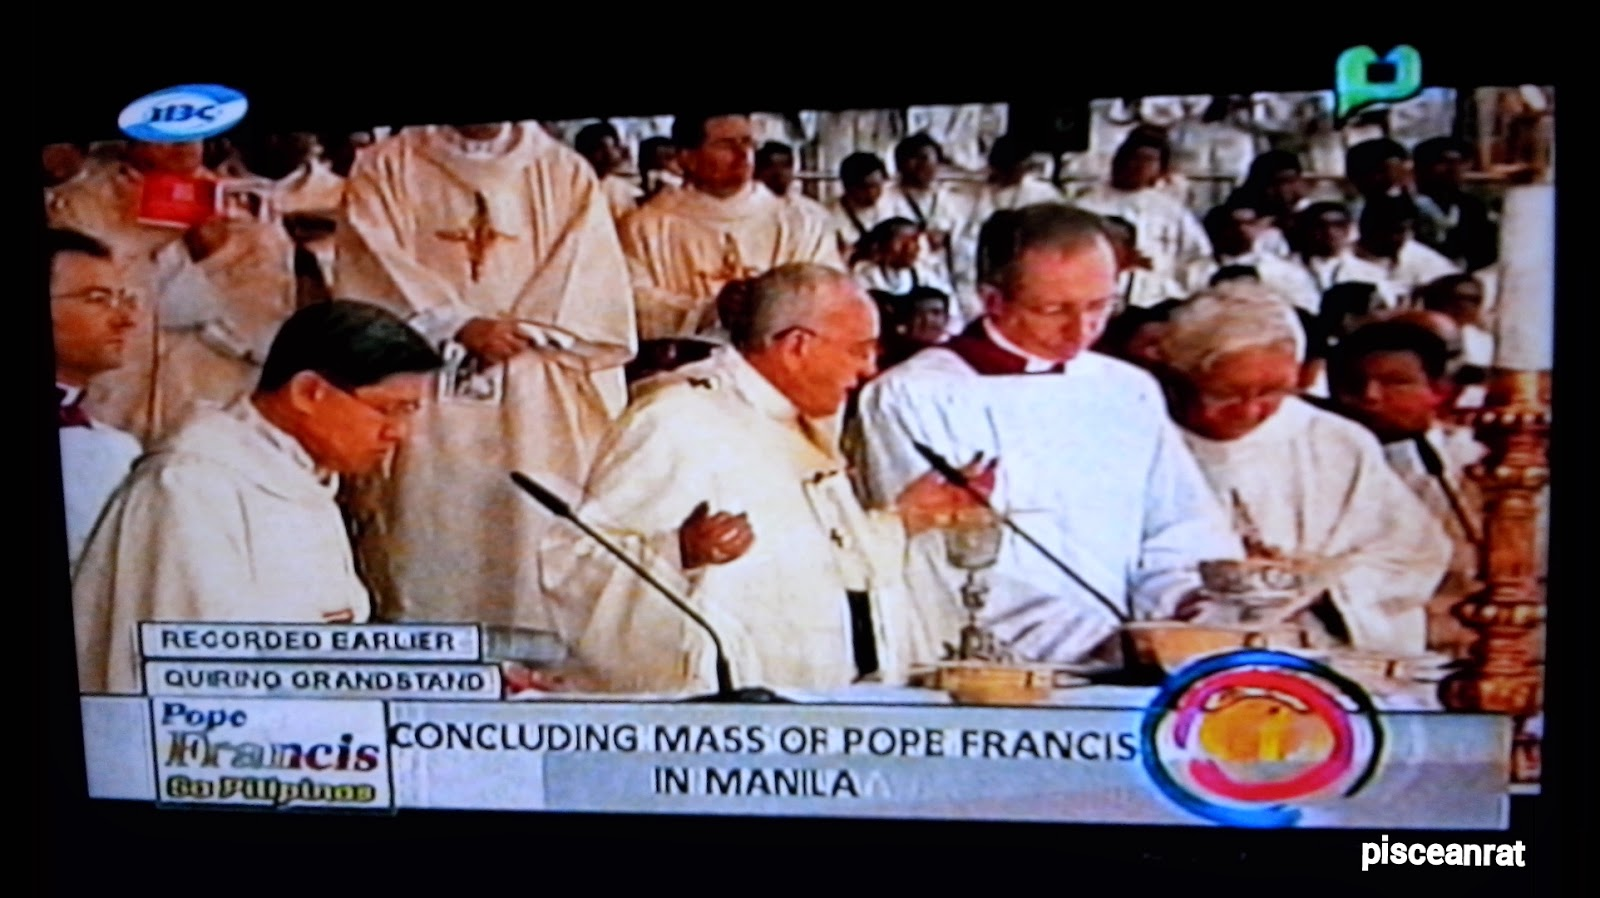 pope francis, mass, quirino grandstand, papal visit, 2015, apostolic nunciature, philippines,